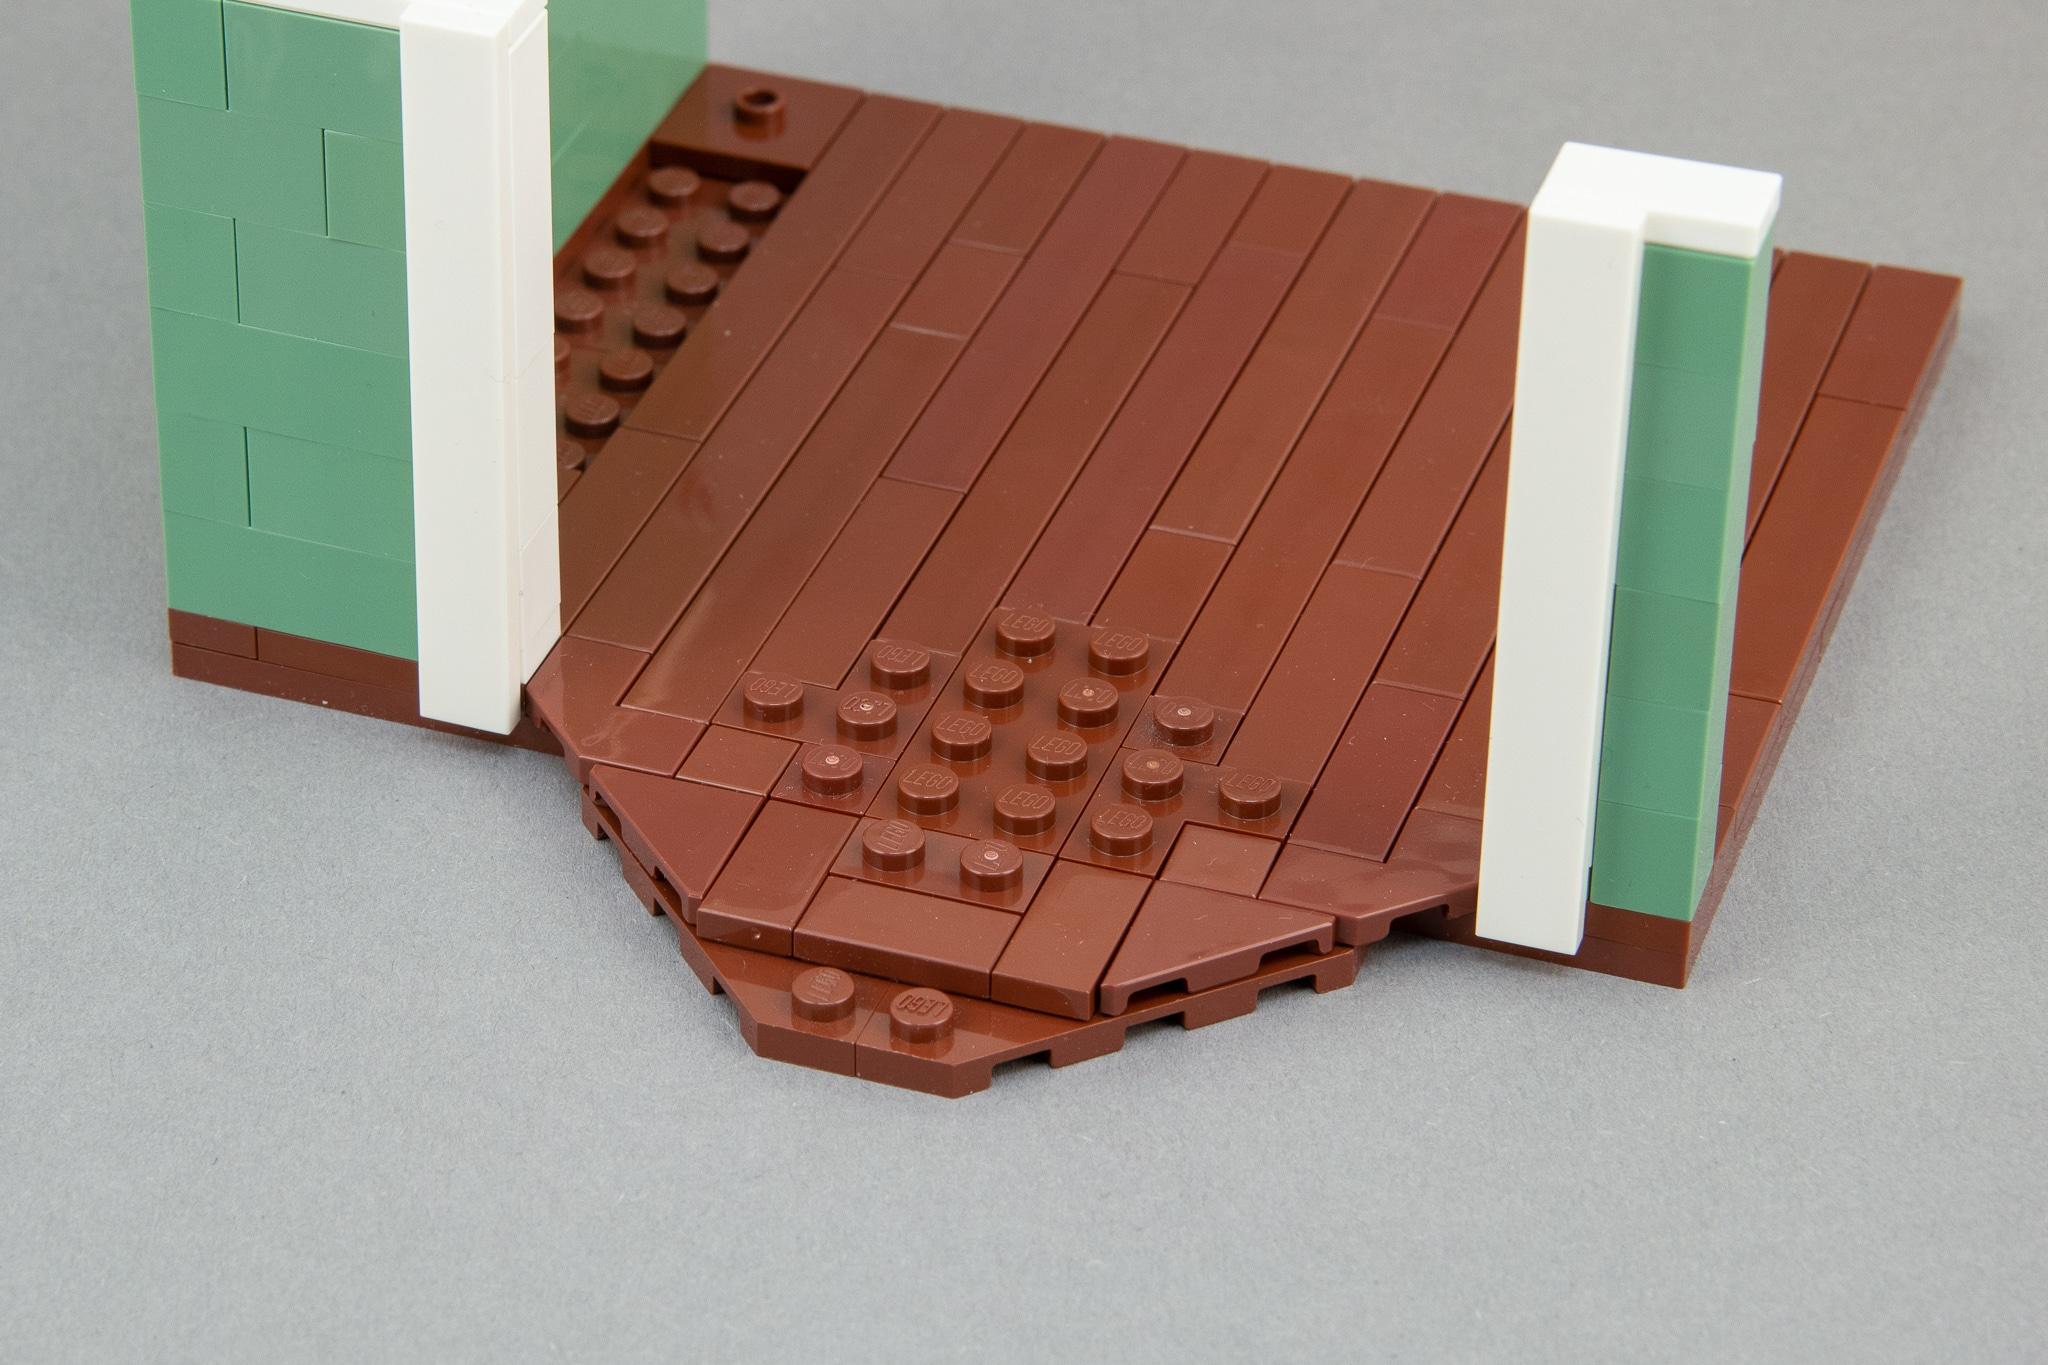 LEGO Moc Bausinpiration Esszimmer (19)